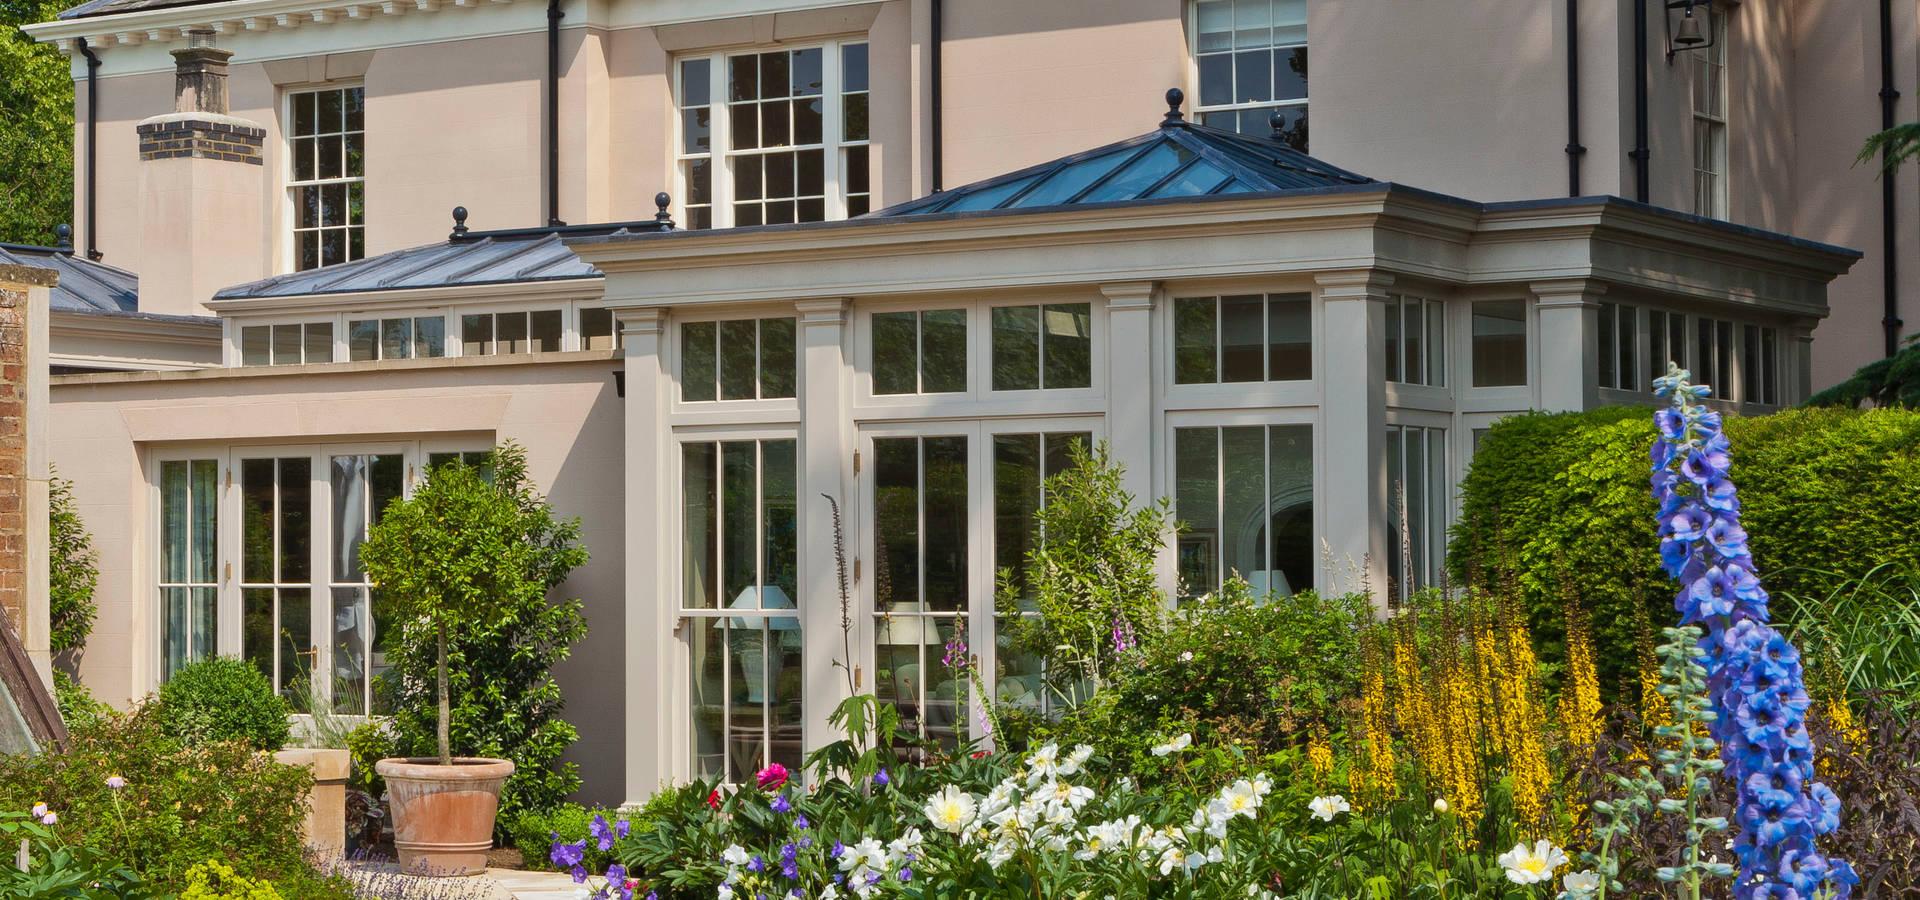 orangery with bi fold doors profesjonalista vale garden. Black Bedroom Furniture Sets. Home Design Ideas